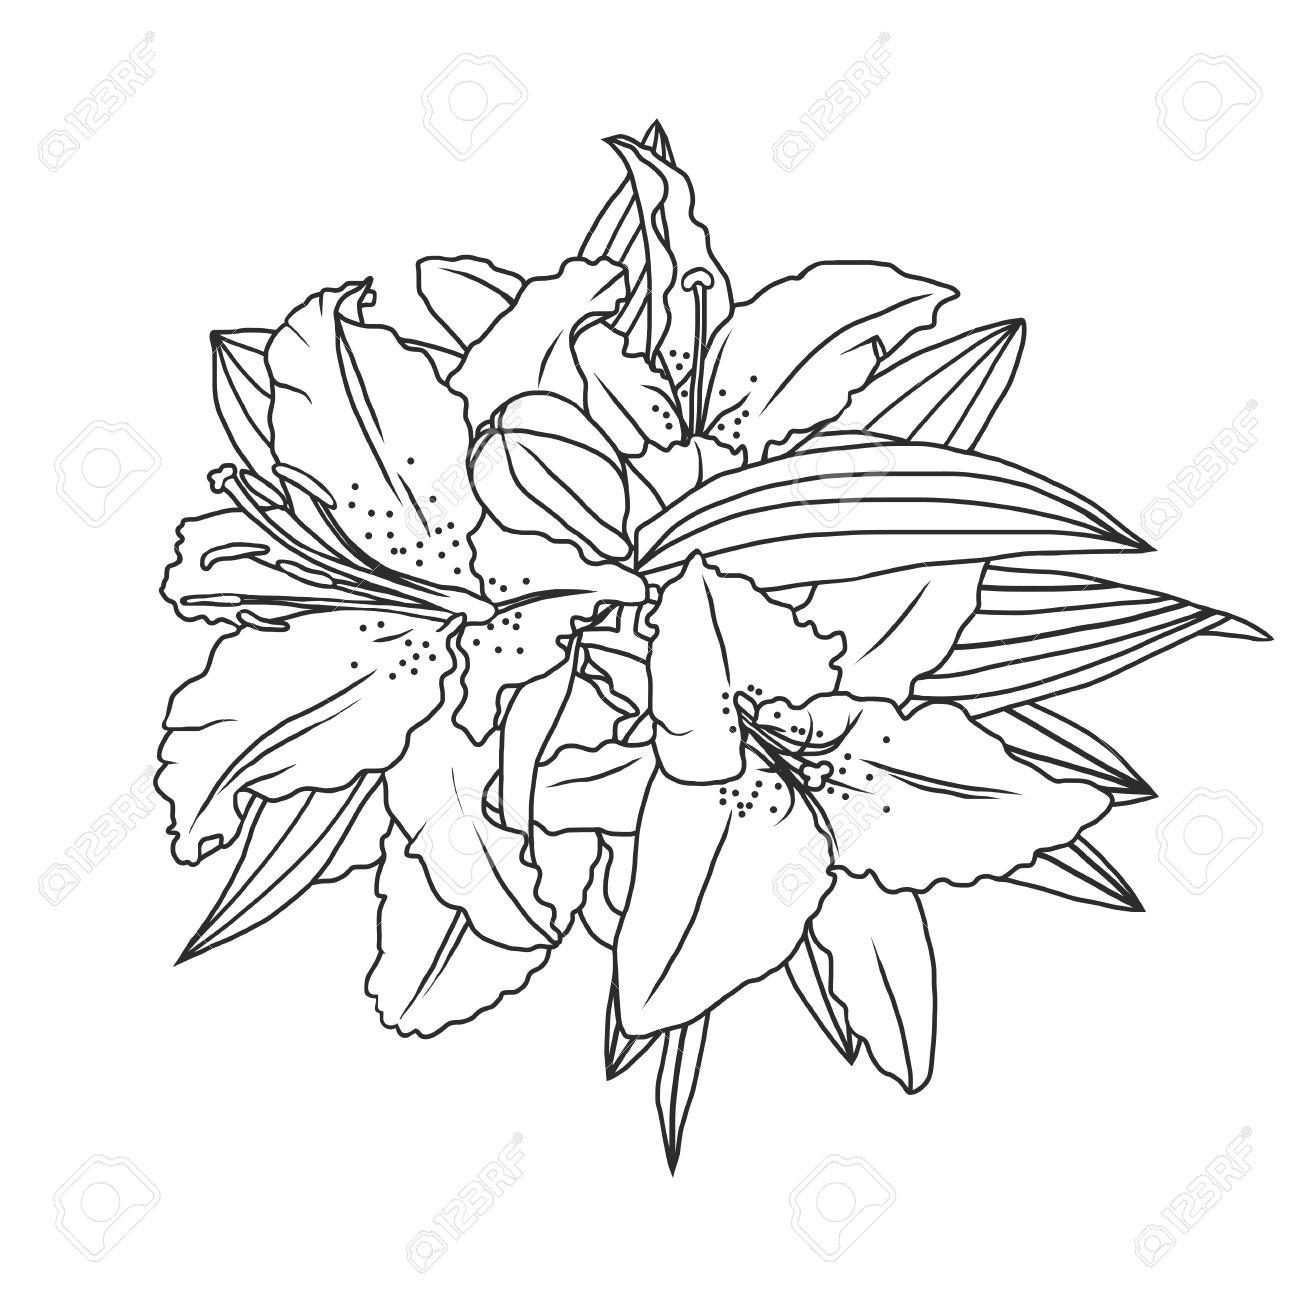 1300x1300 Drawn Lily Line Drawing